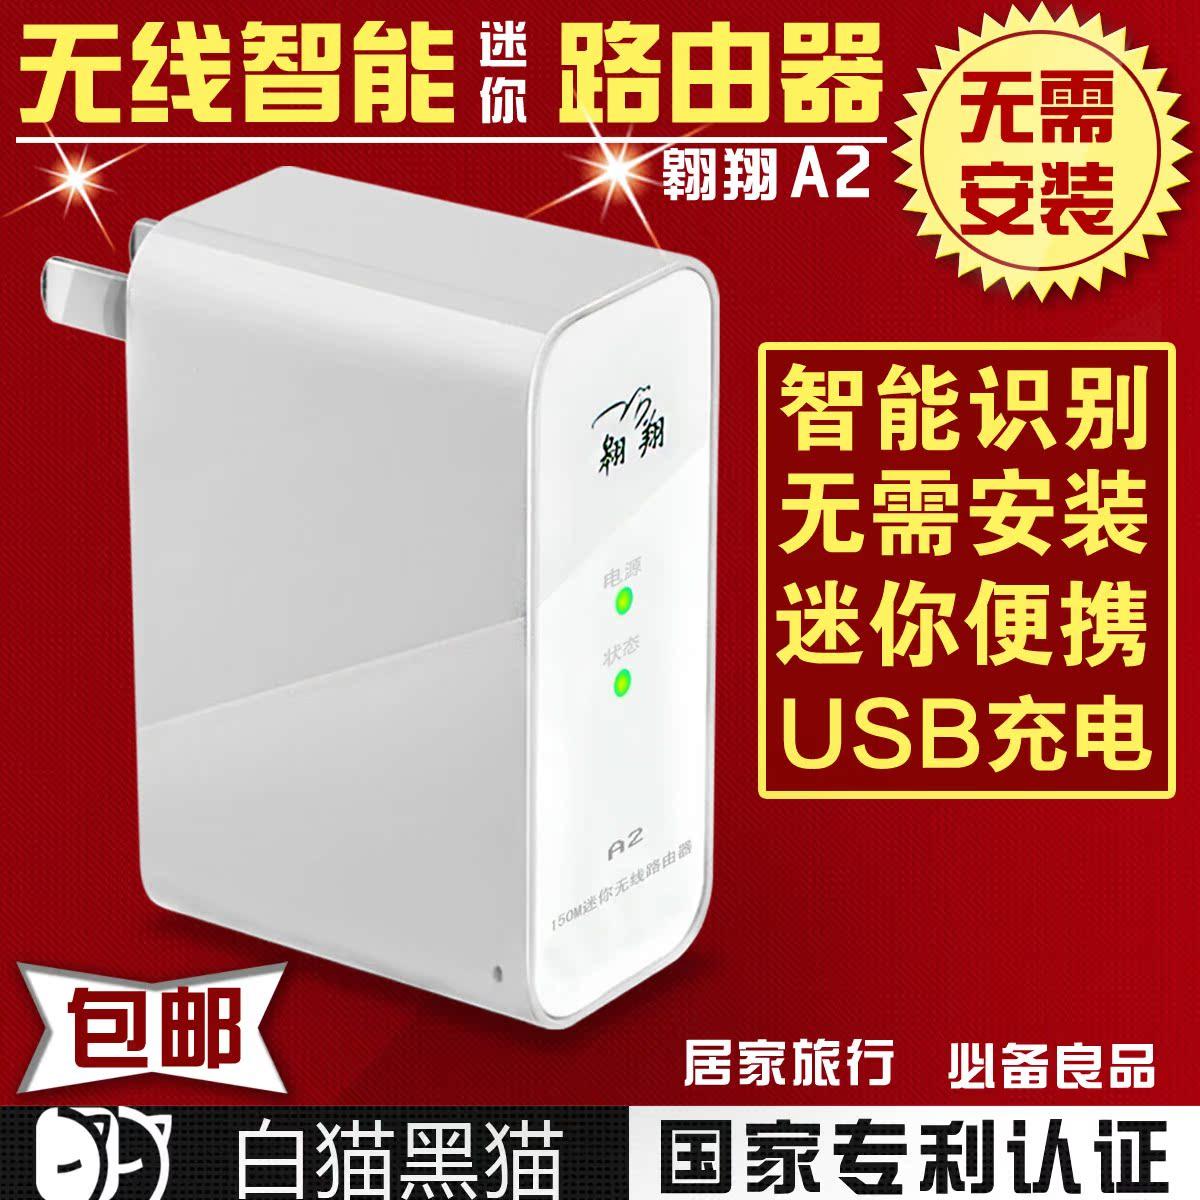 Беспроводной маршрутизатор Soar  A2 USB Wifi